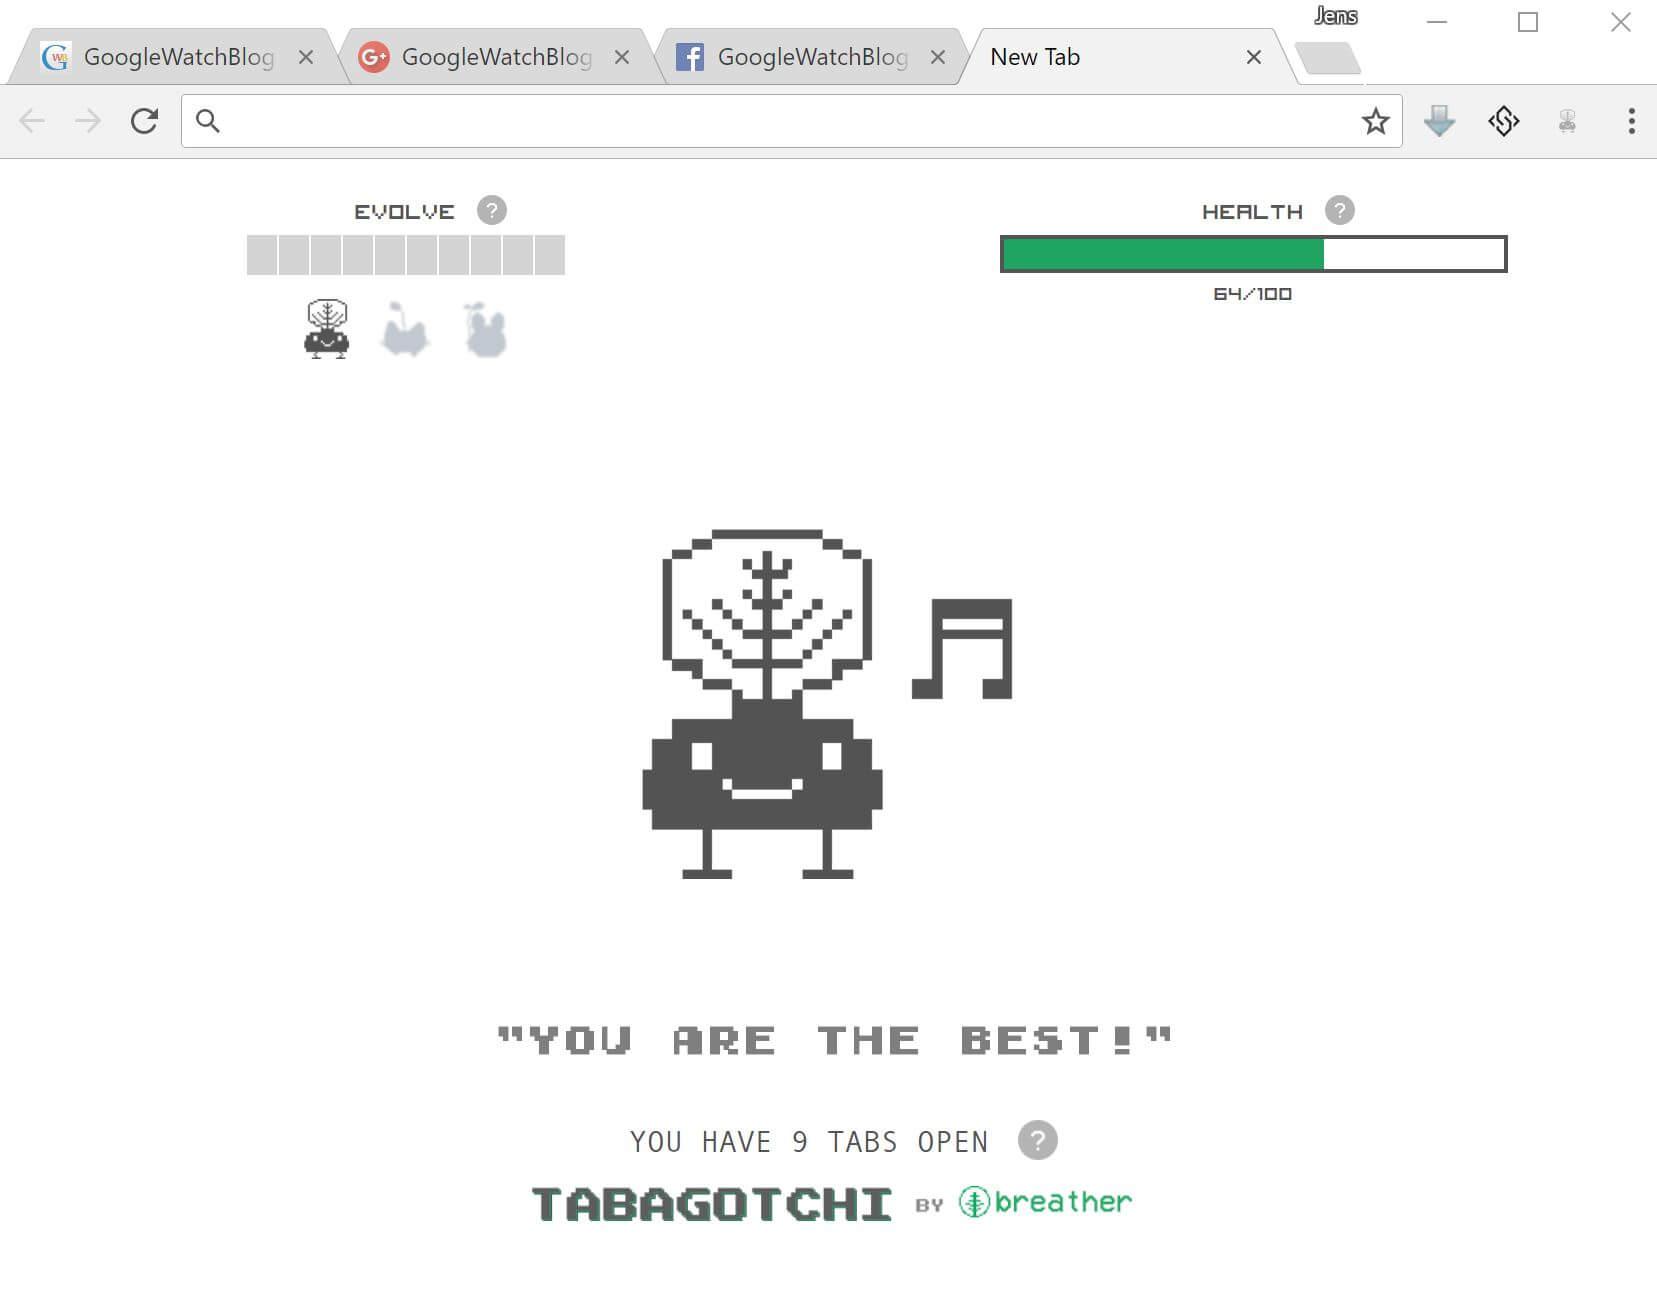 Tabagotchi